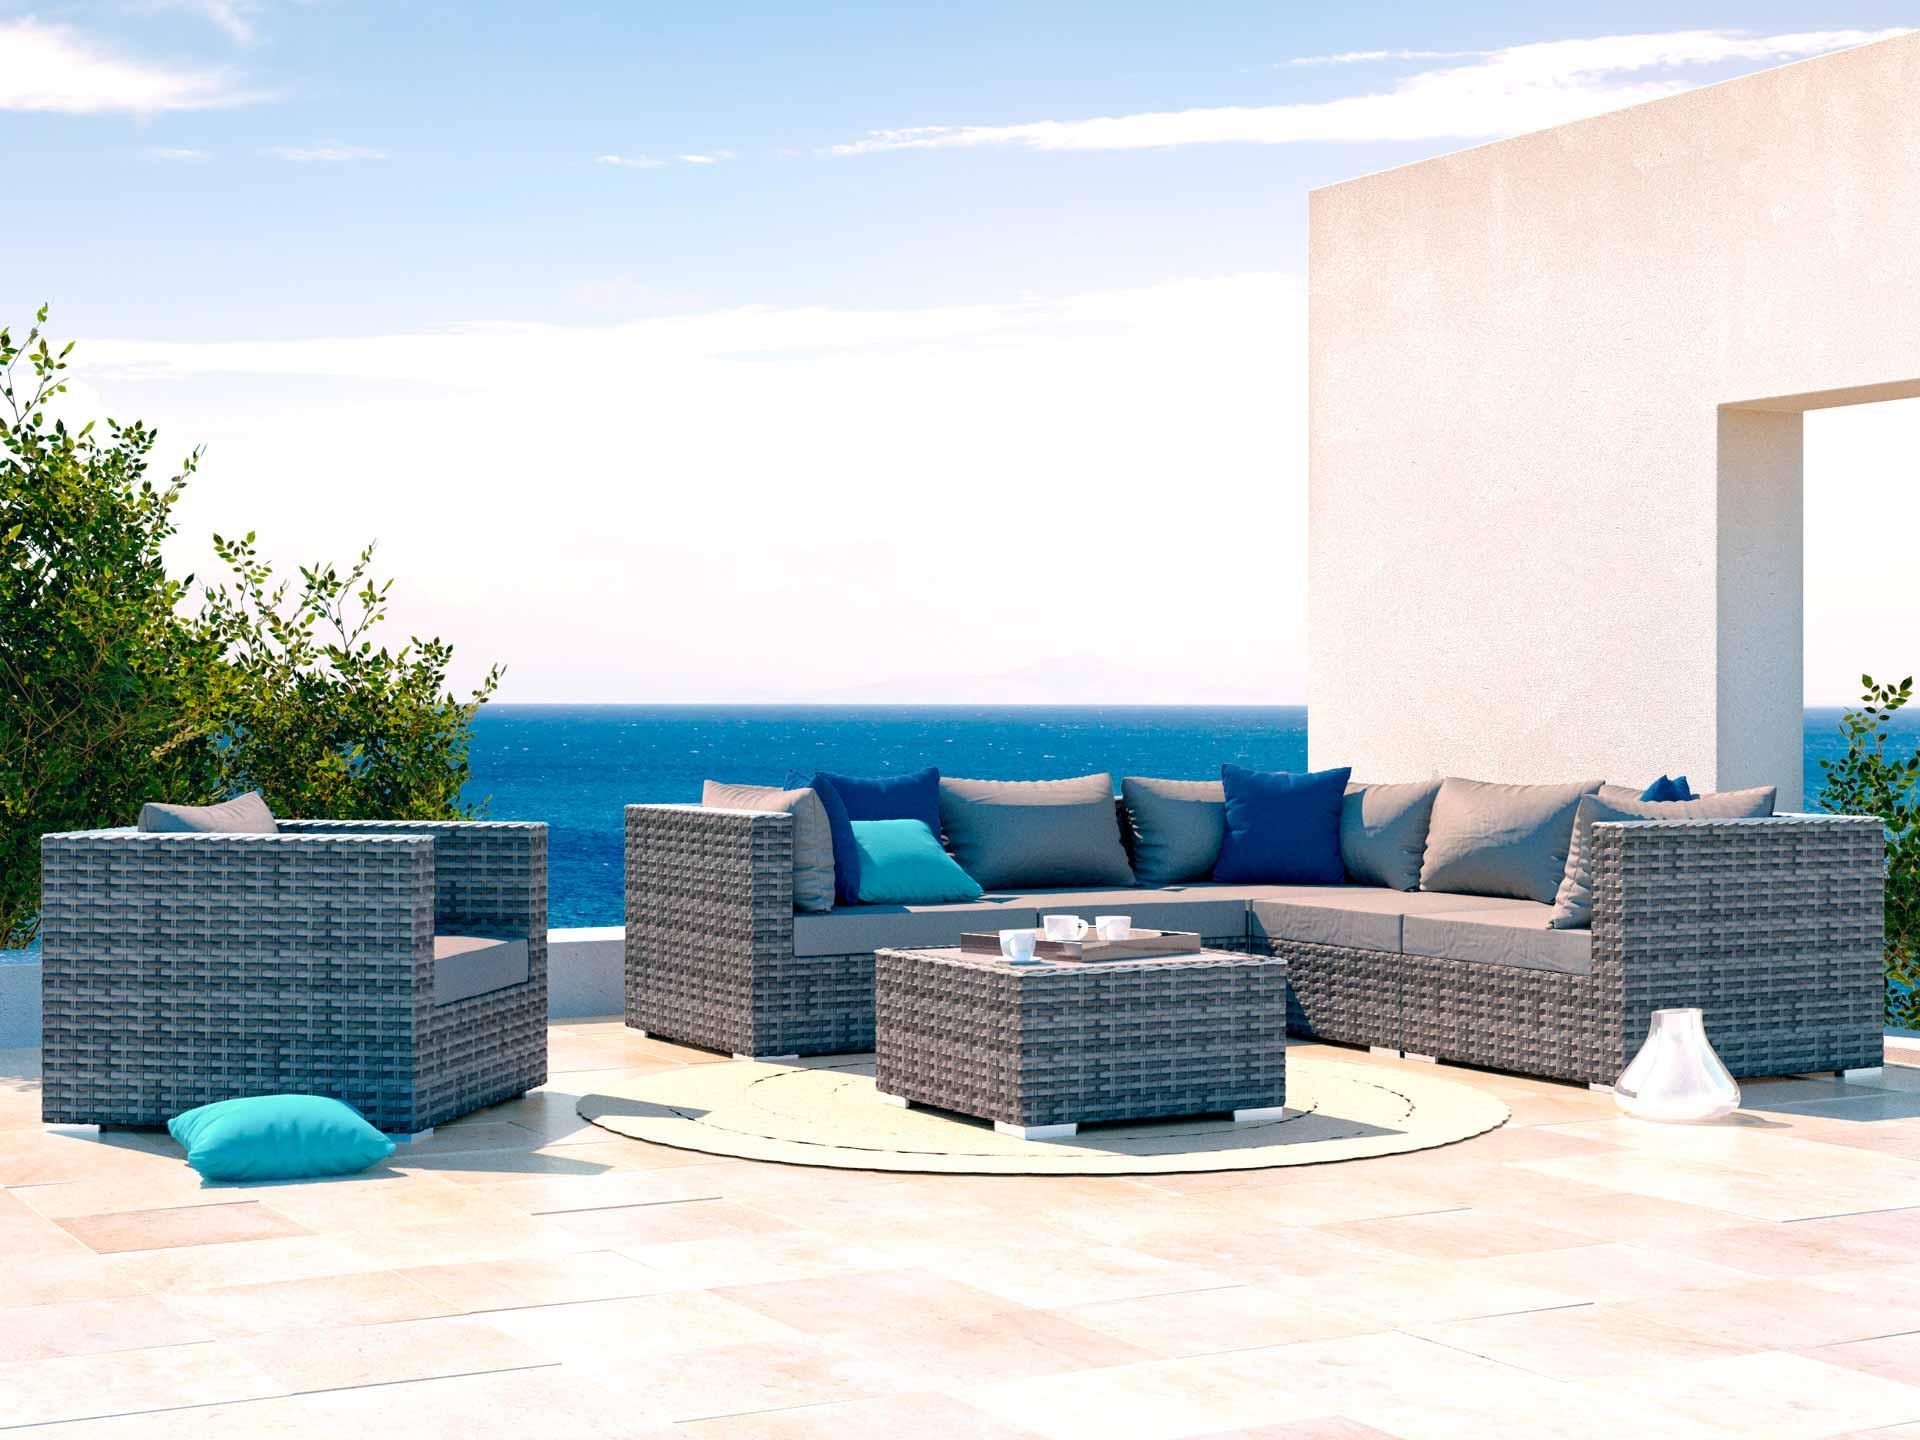 artelia salotto da giardino epona. Black Bedroom Furniture Sets. Home Design Ideas